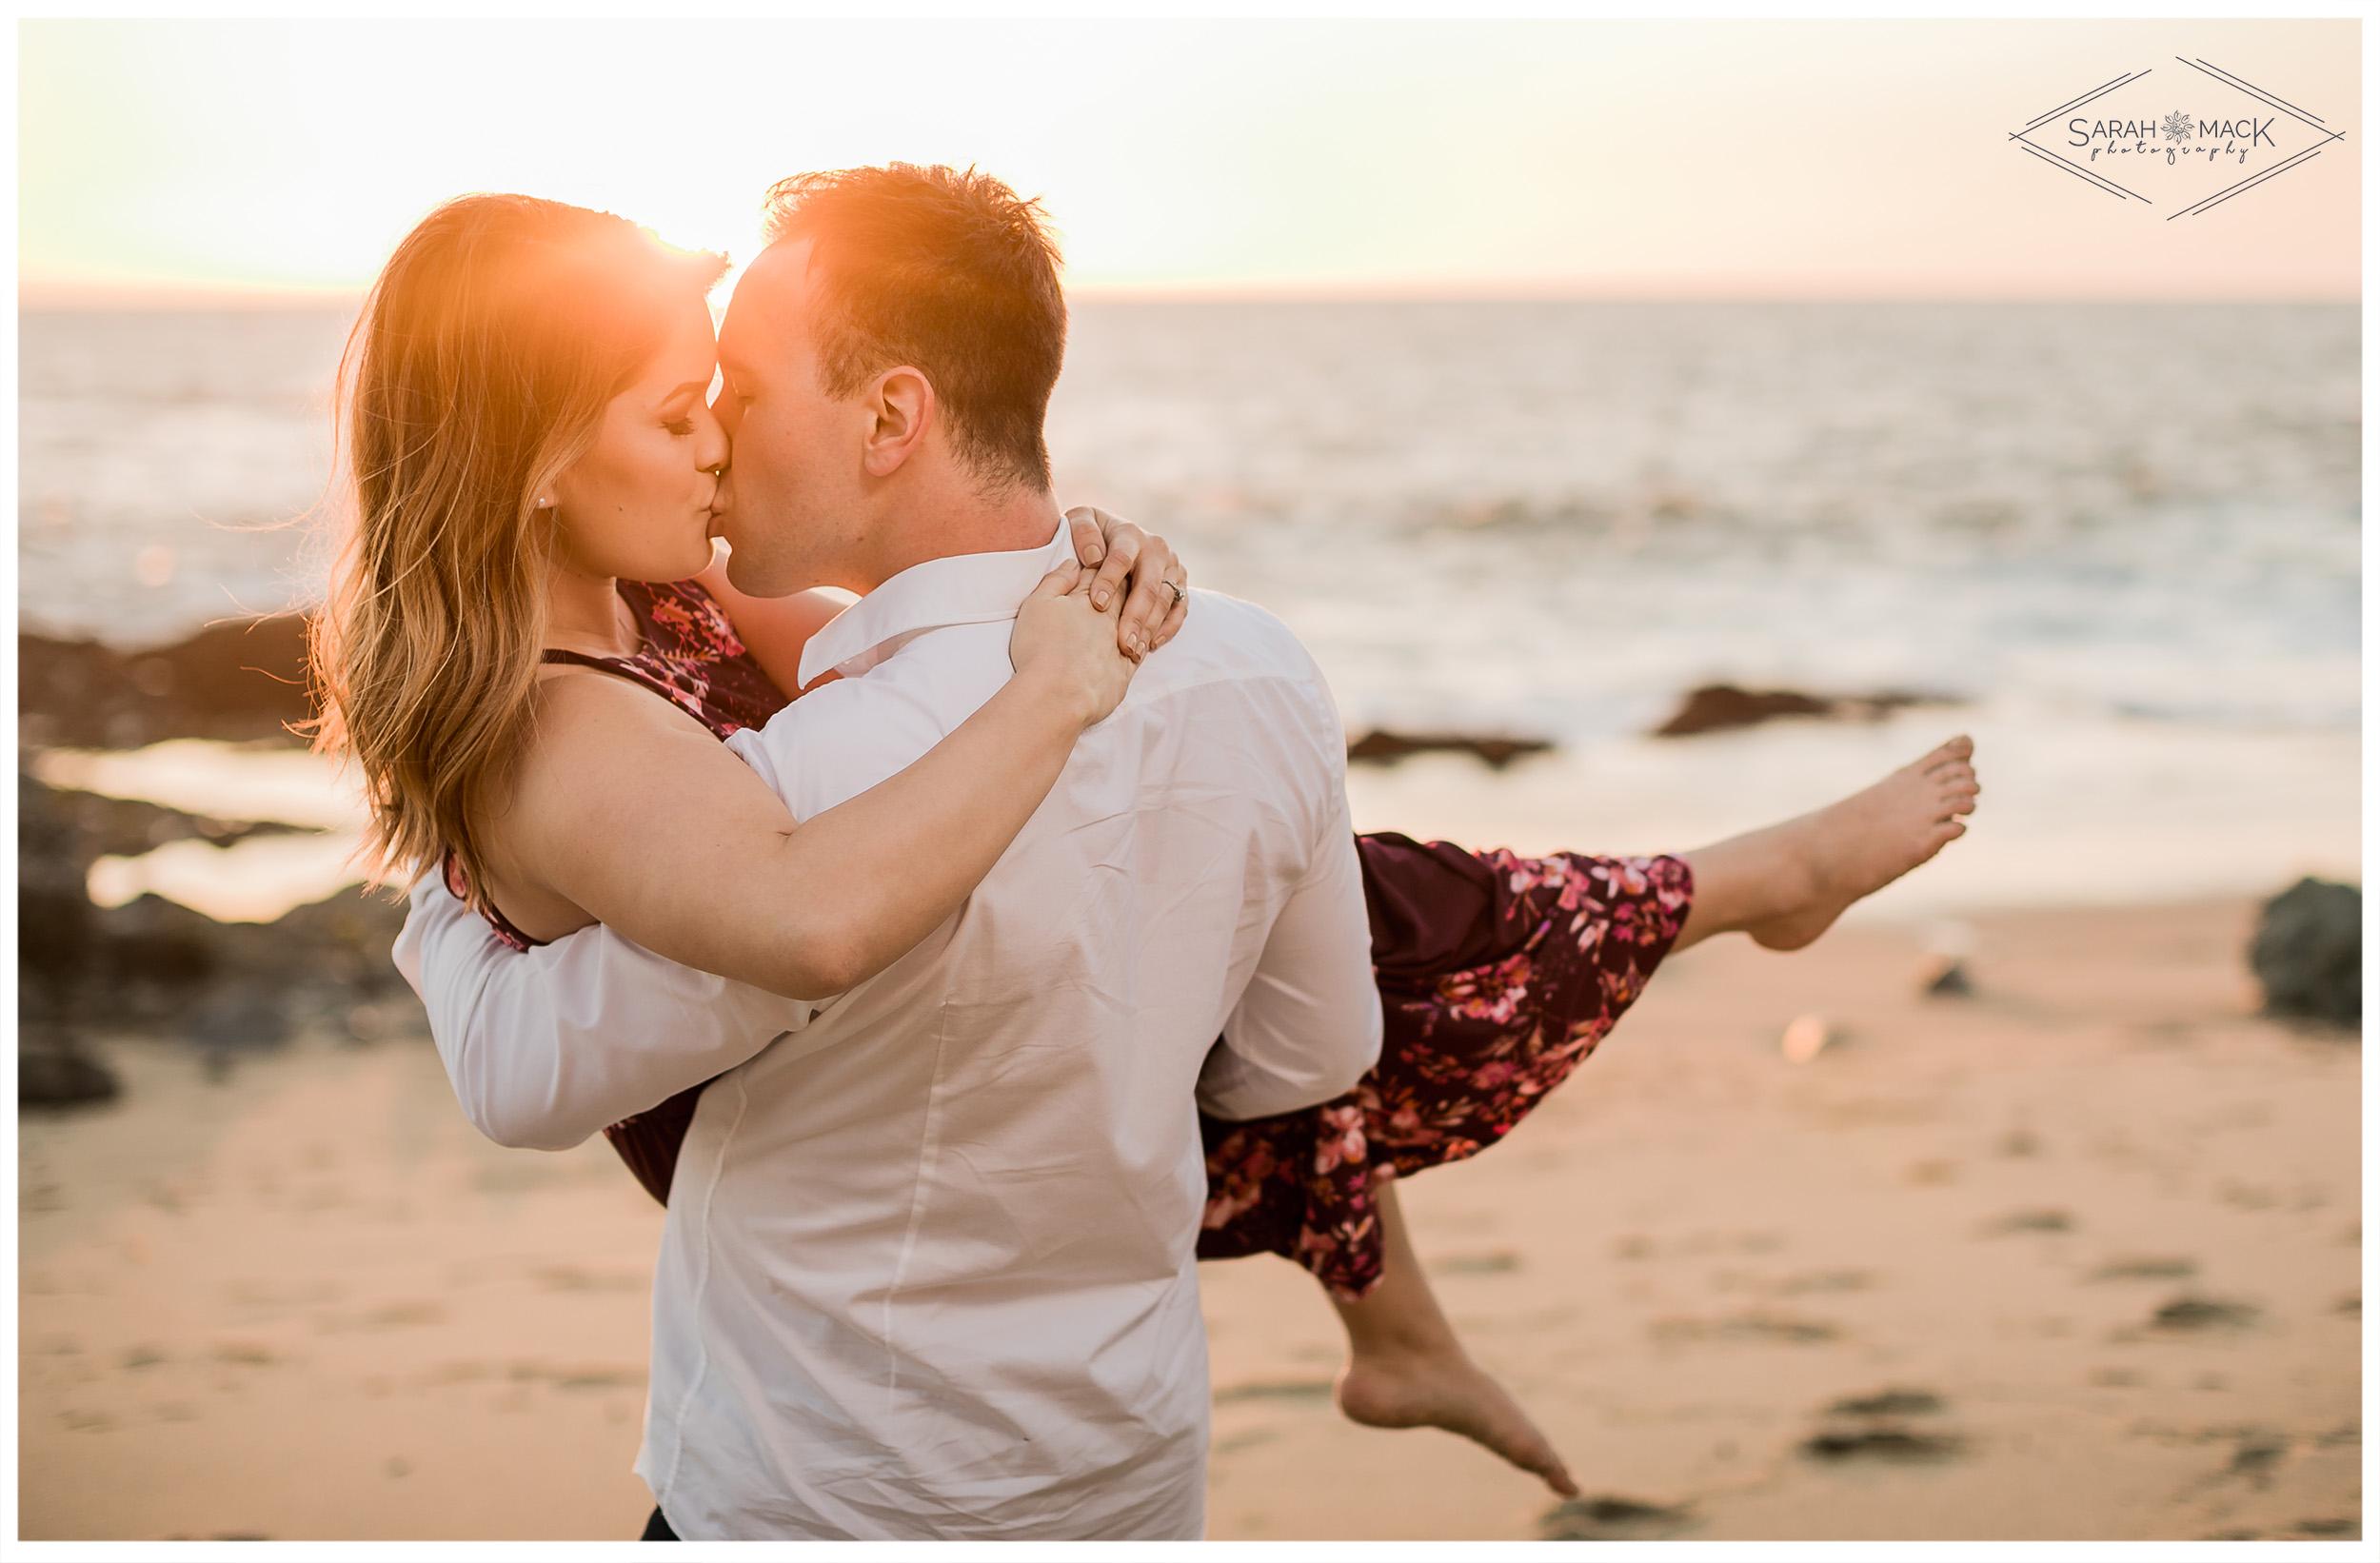 LN-Table-Rock-Beach-Laguna-Engagement-Photography-16.jpg